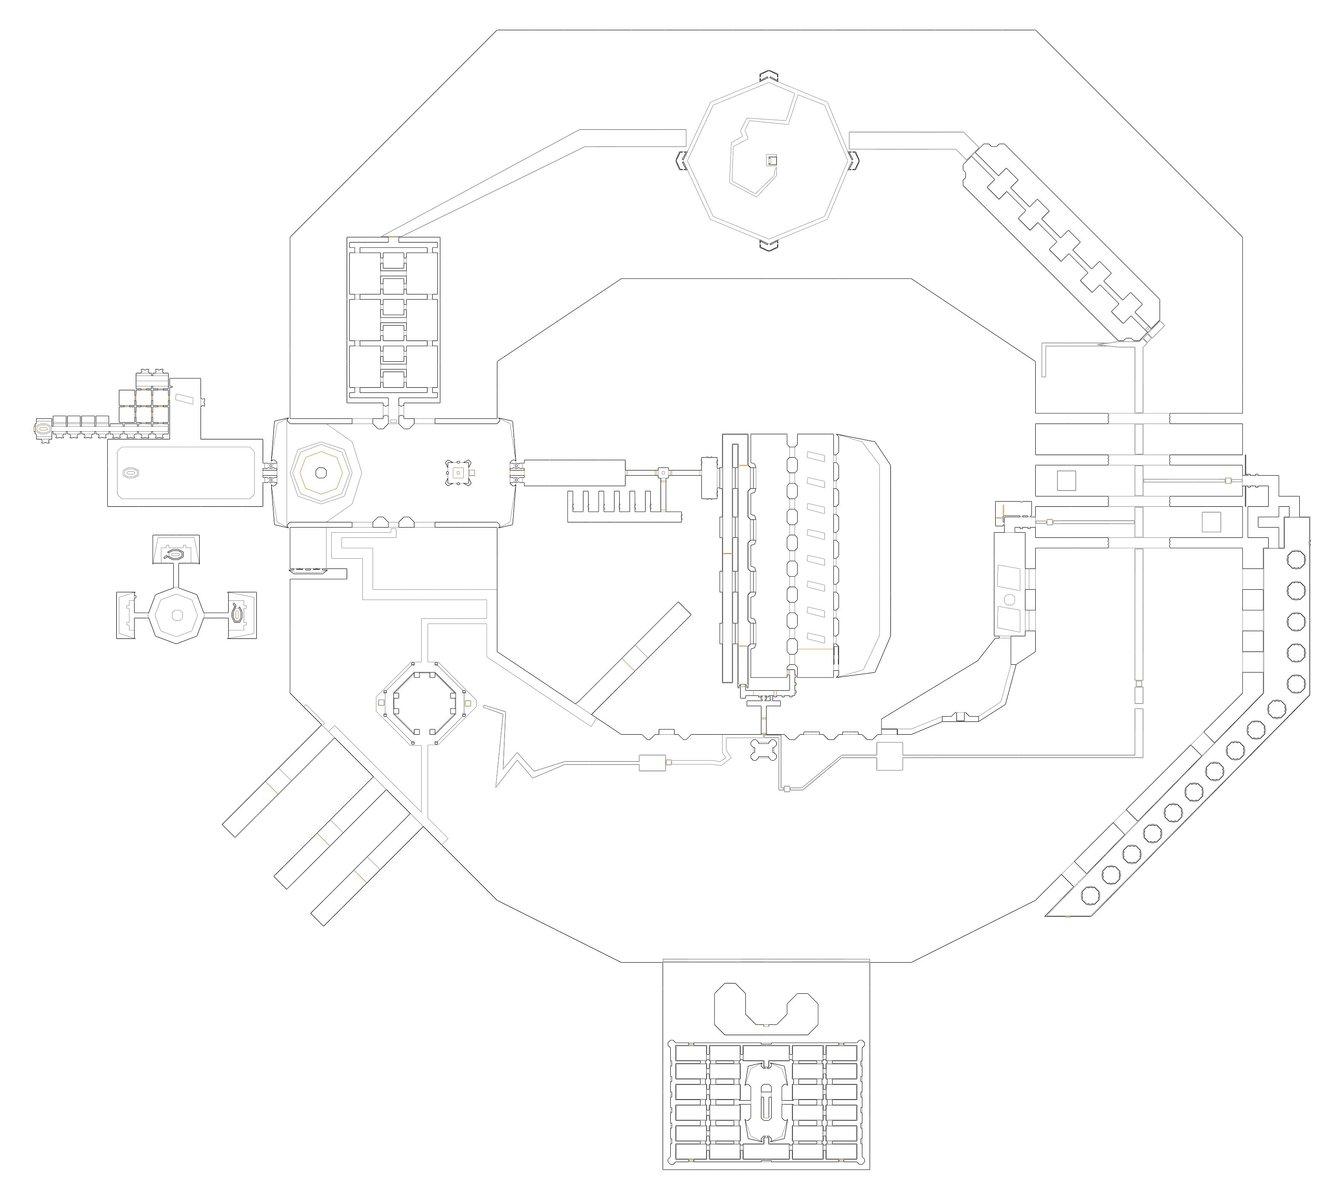 sector10.wad_MAP01.jpg.851b6a42f3d1f2500eba1b7585298d01.jpg